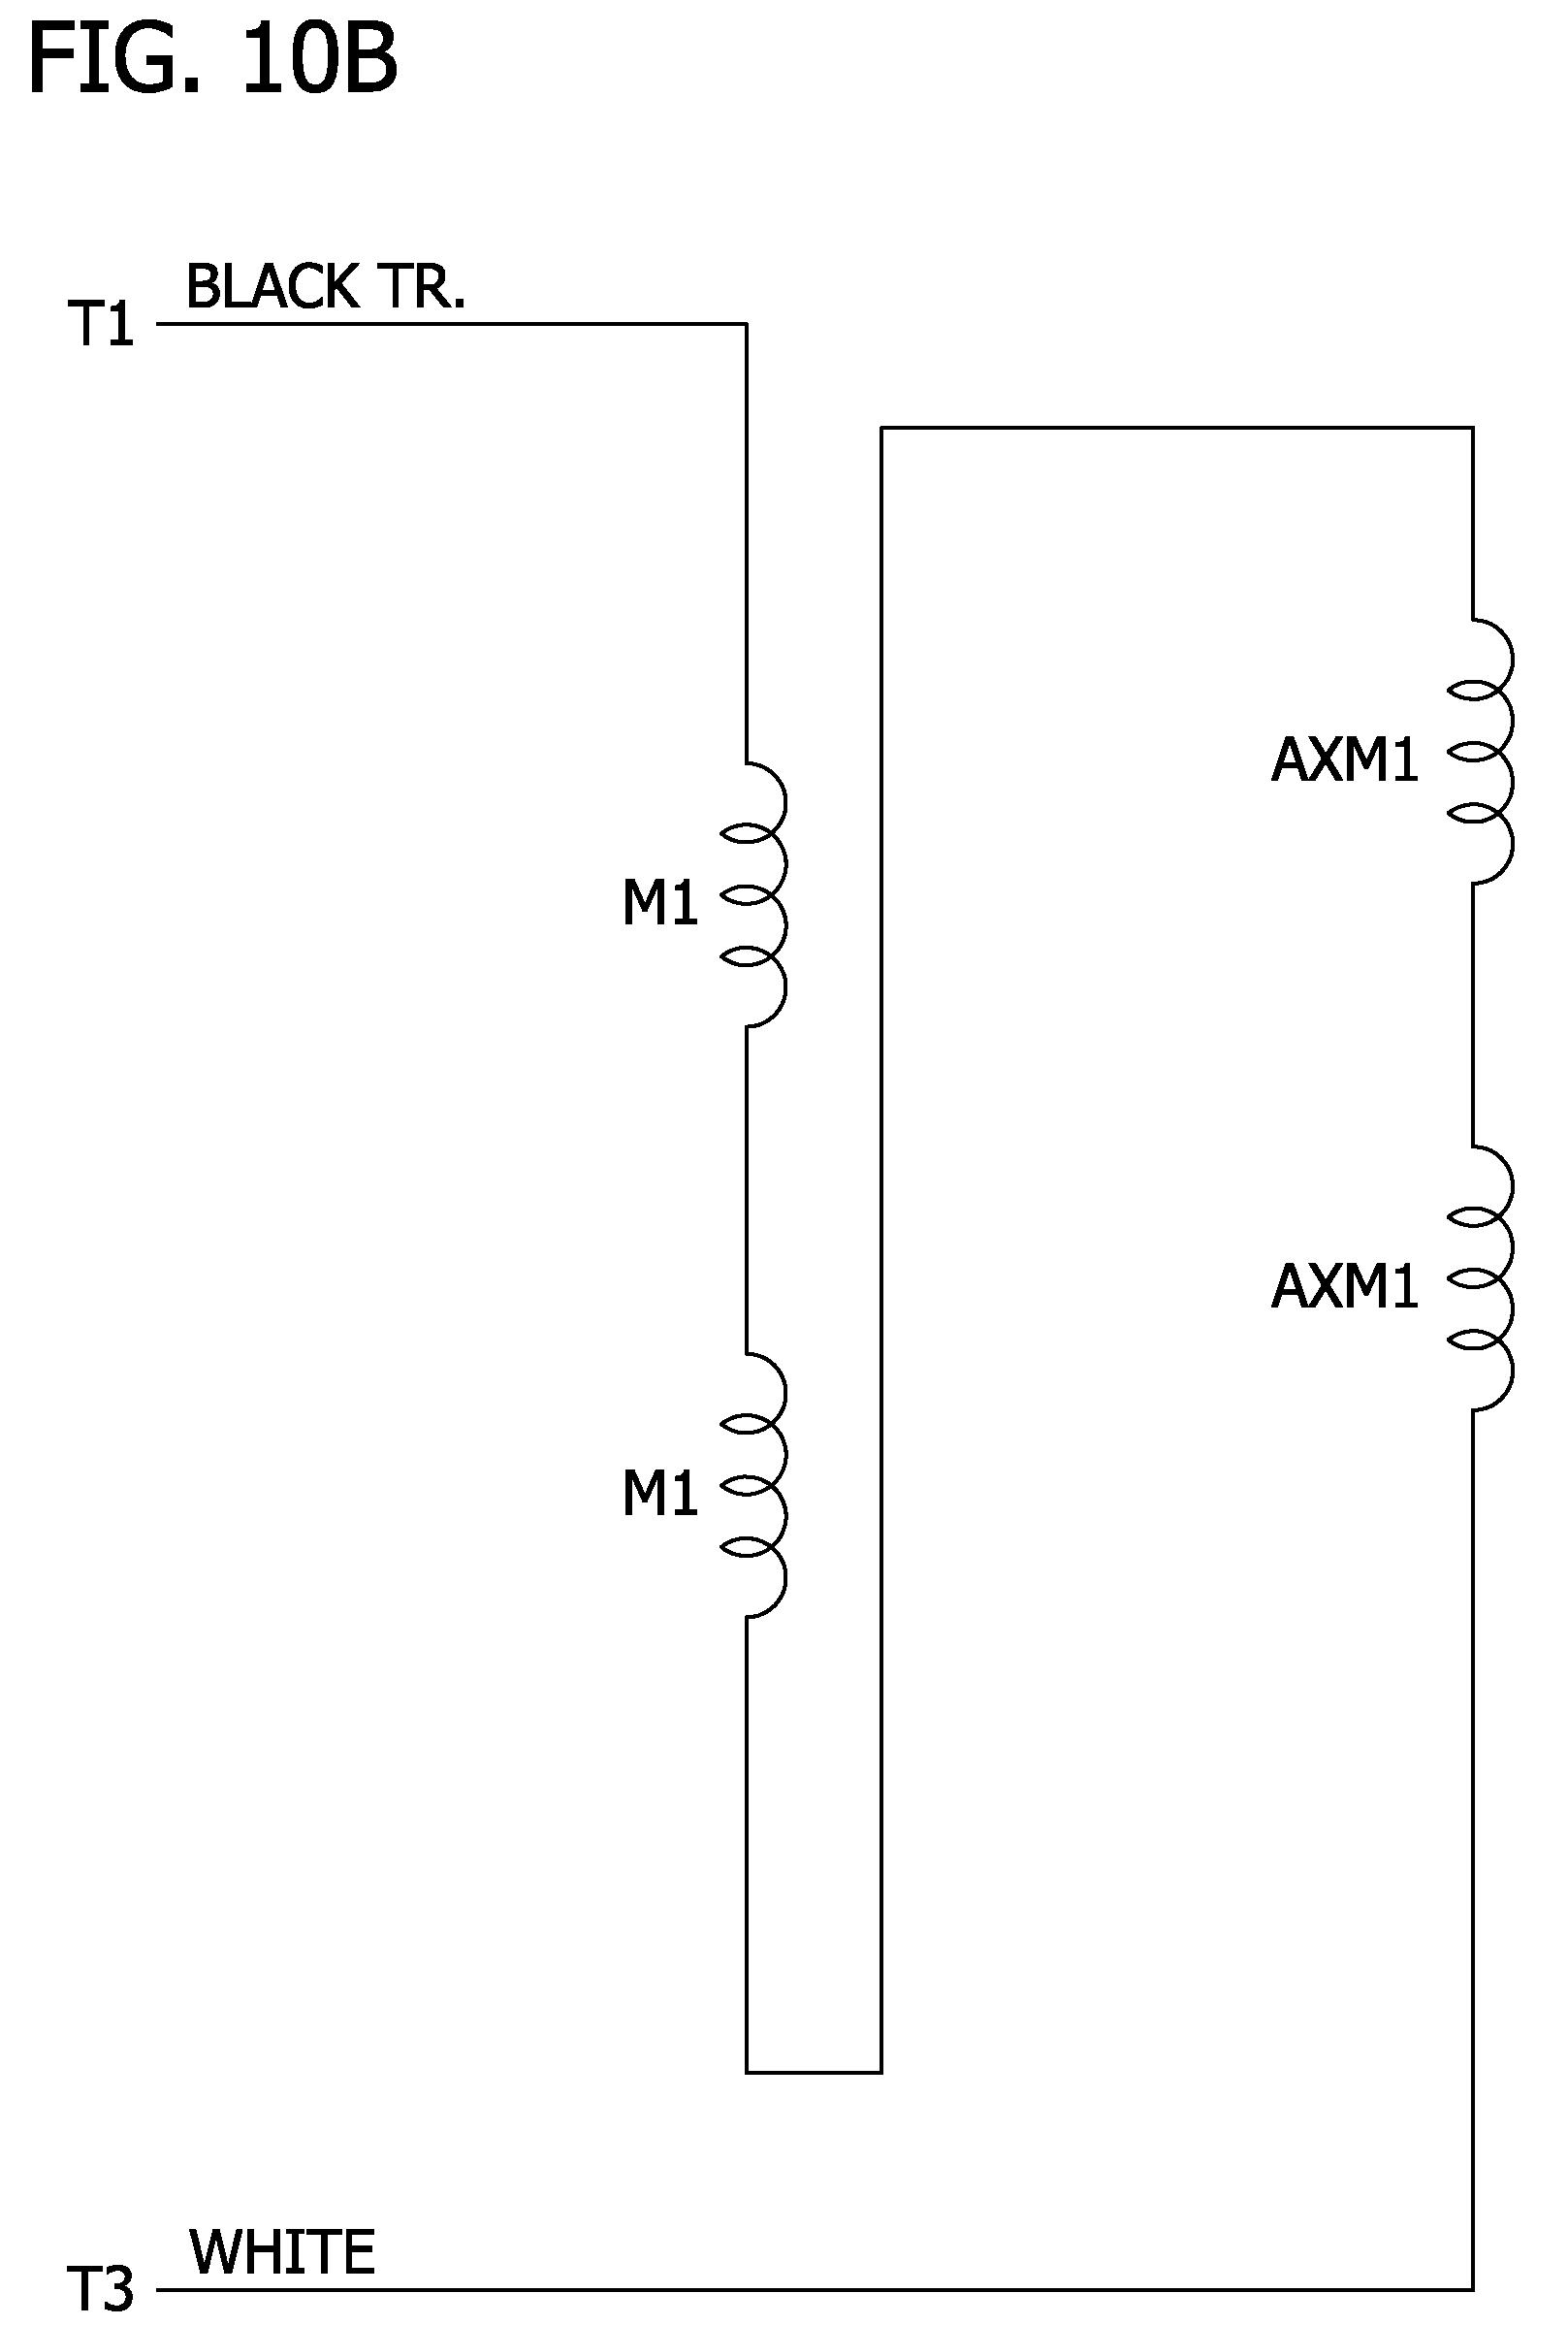 Delphi Delco Electronics Wiring Diagram